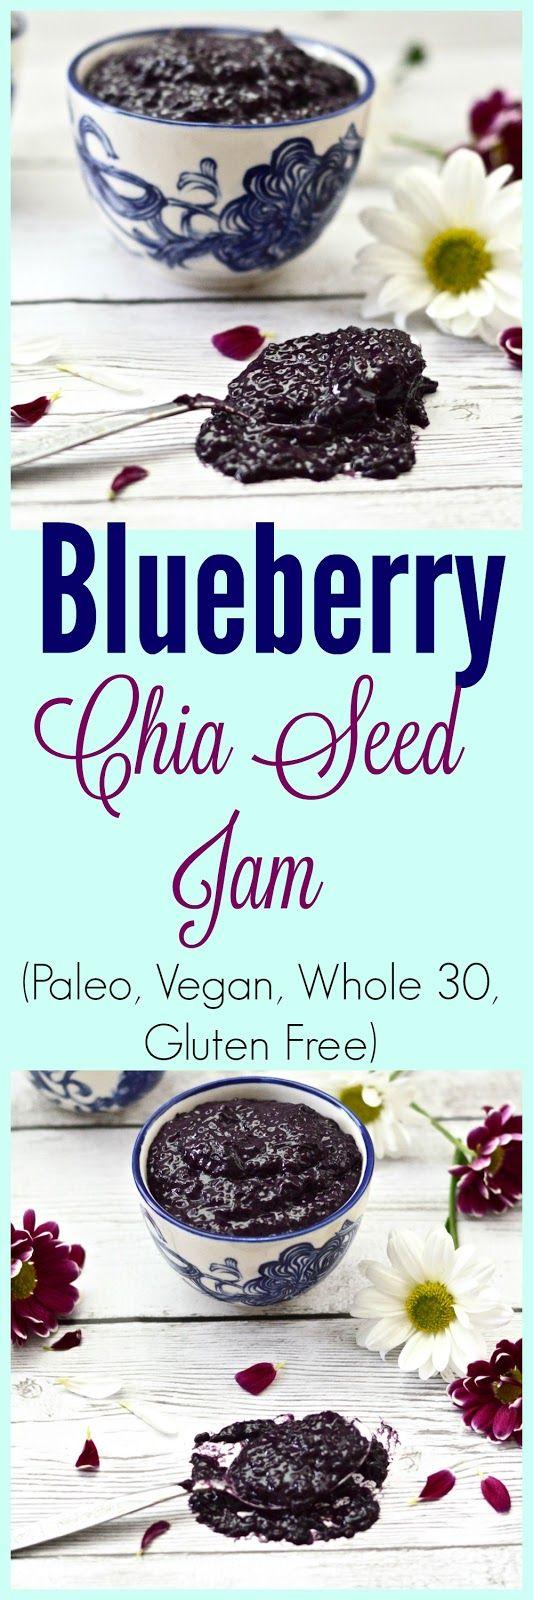 Blueberry Coconut Chia Seed Jam (Paleo, Gluten Free, Sugar Free, Whole 30, Vegan)